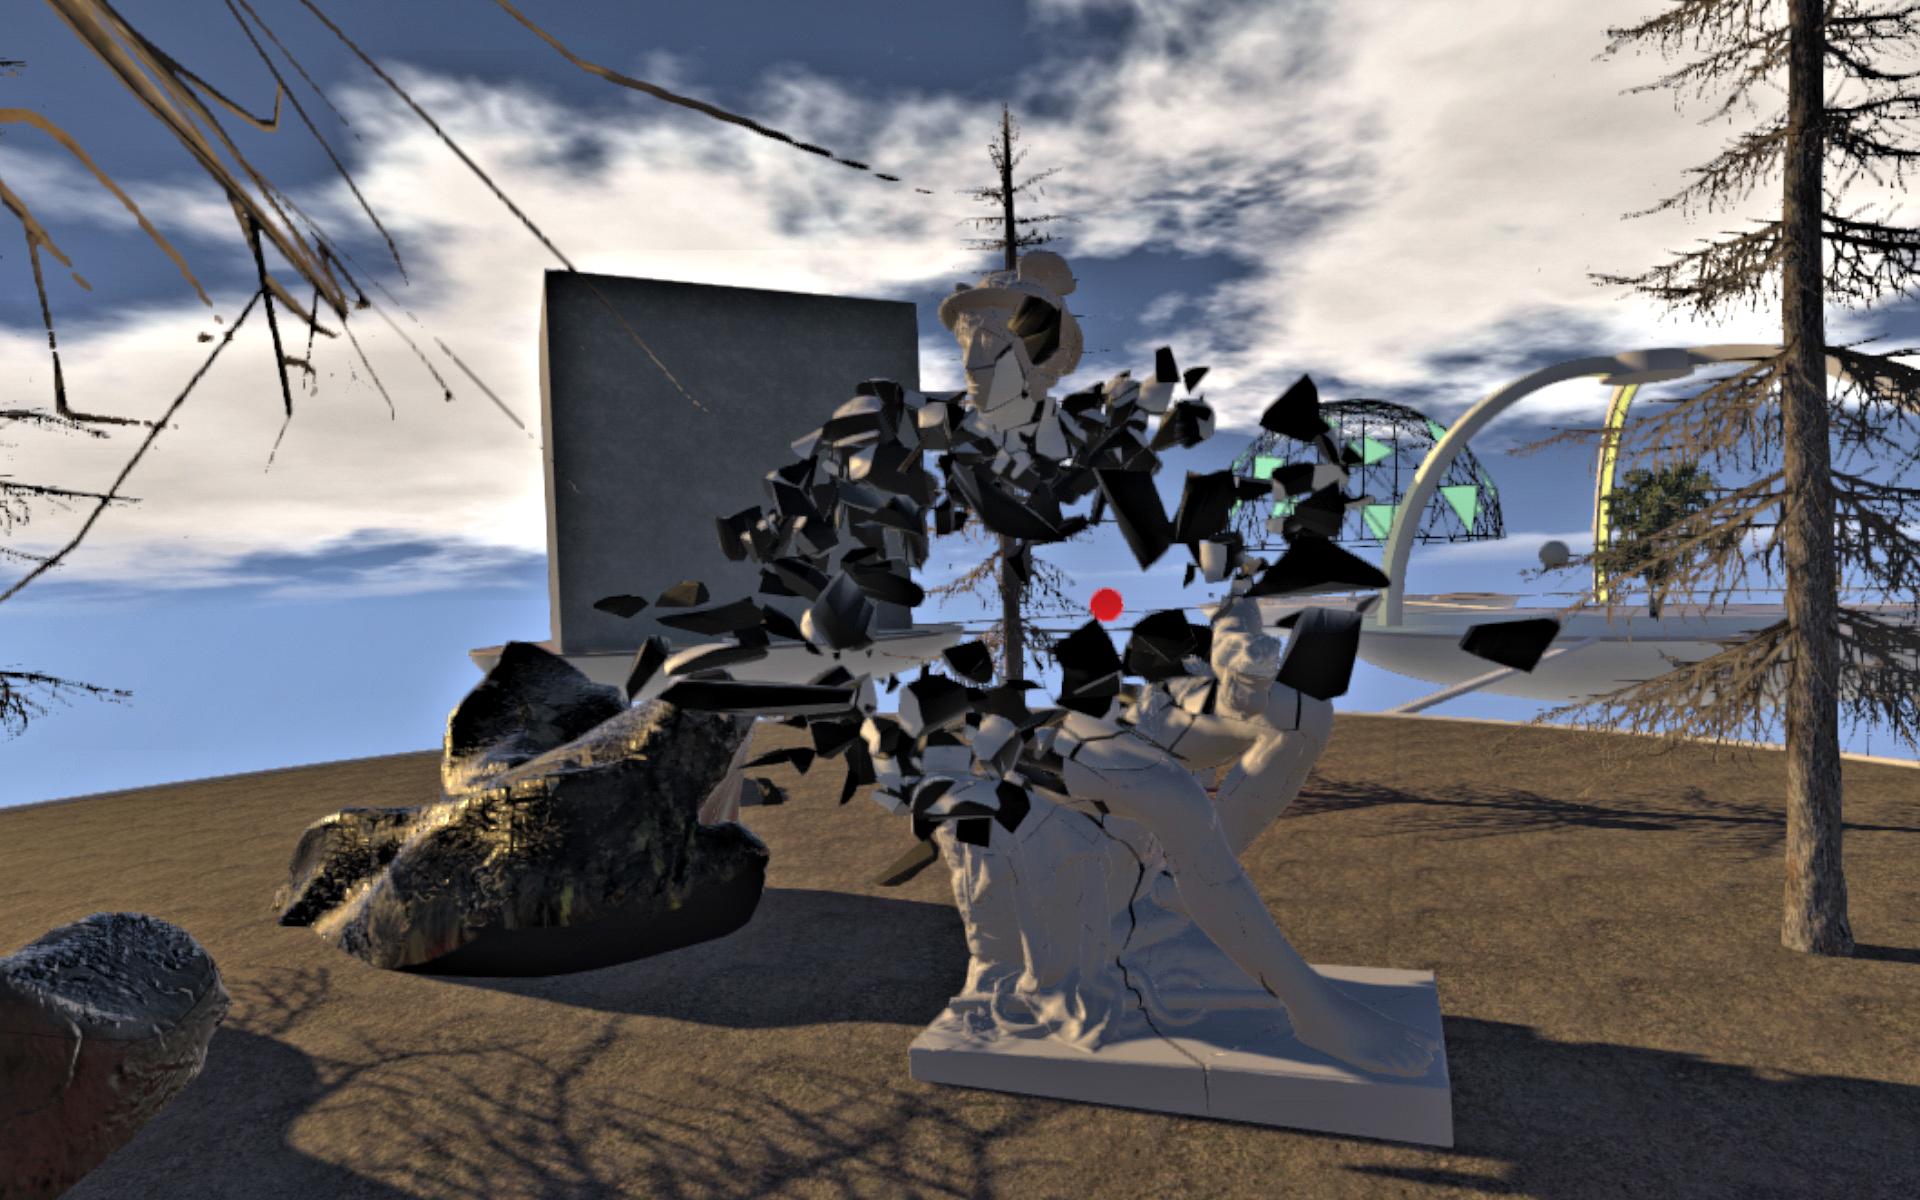 Banz & Bowinkel, Mercury, Virtual Reality experience, 2017